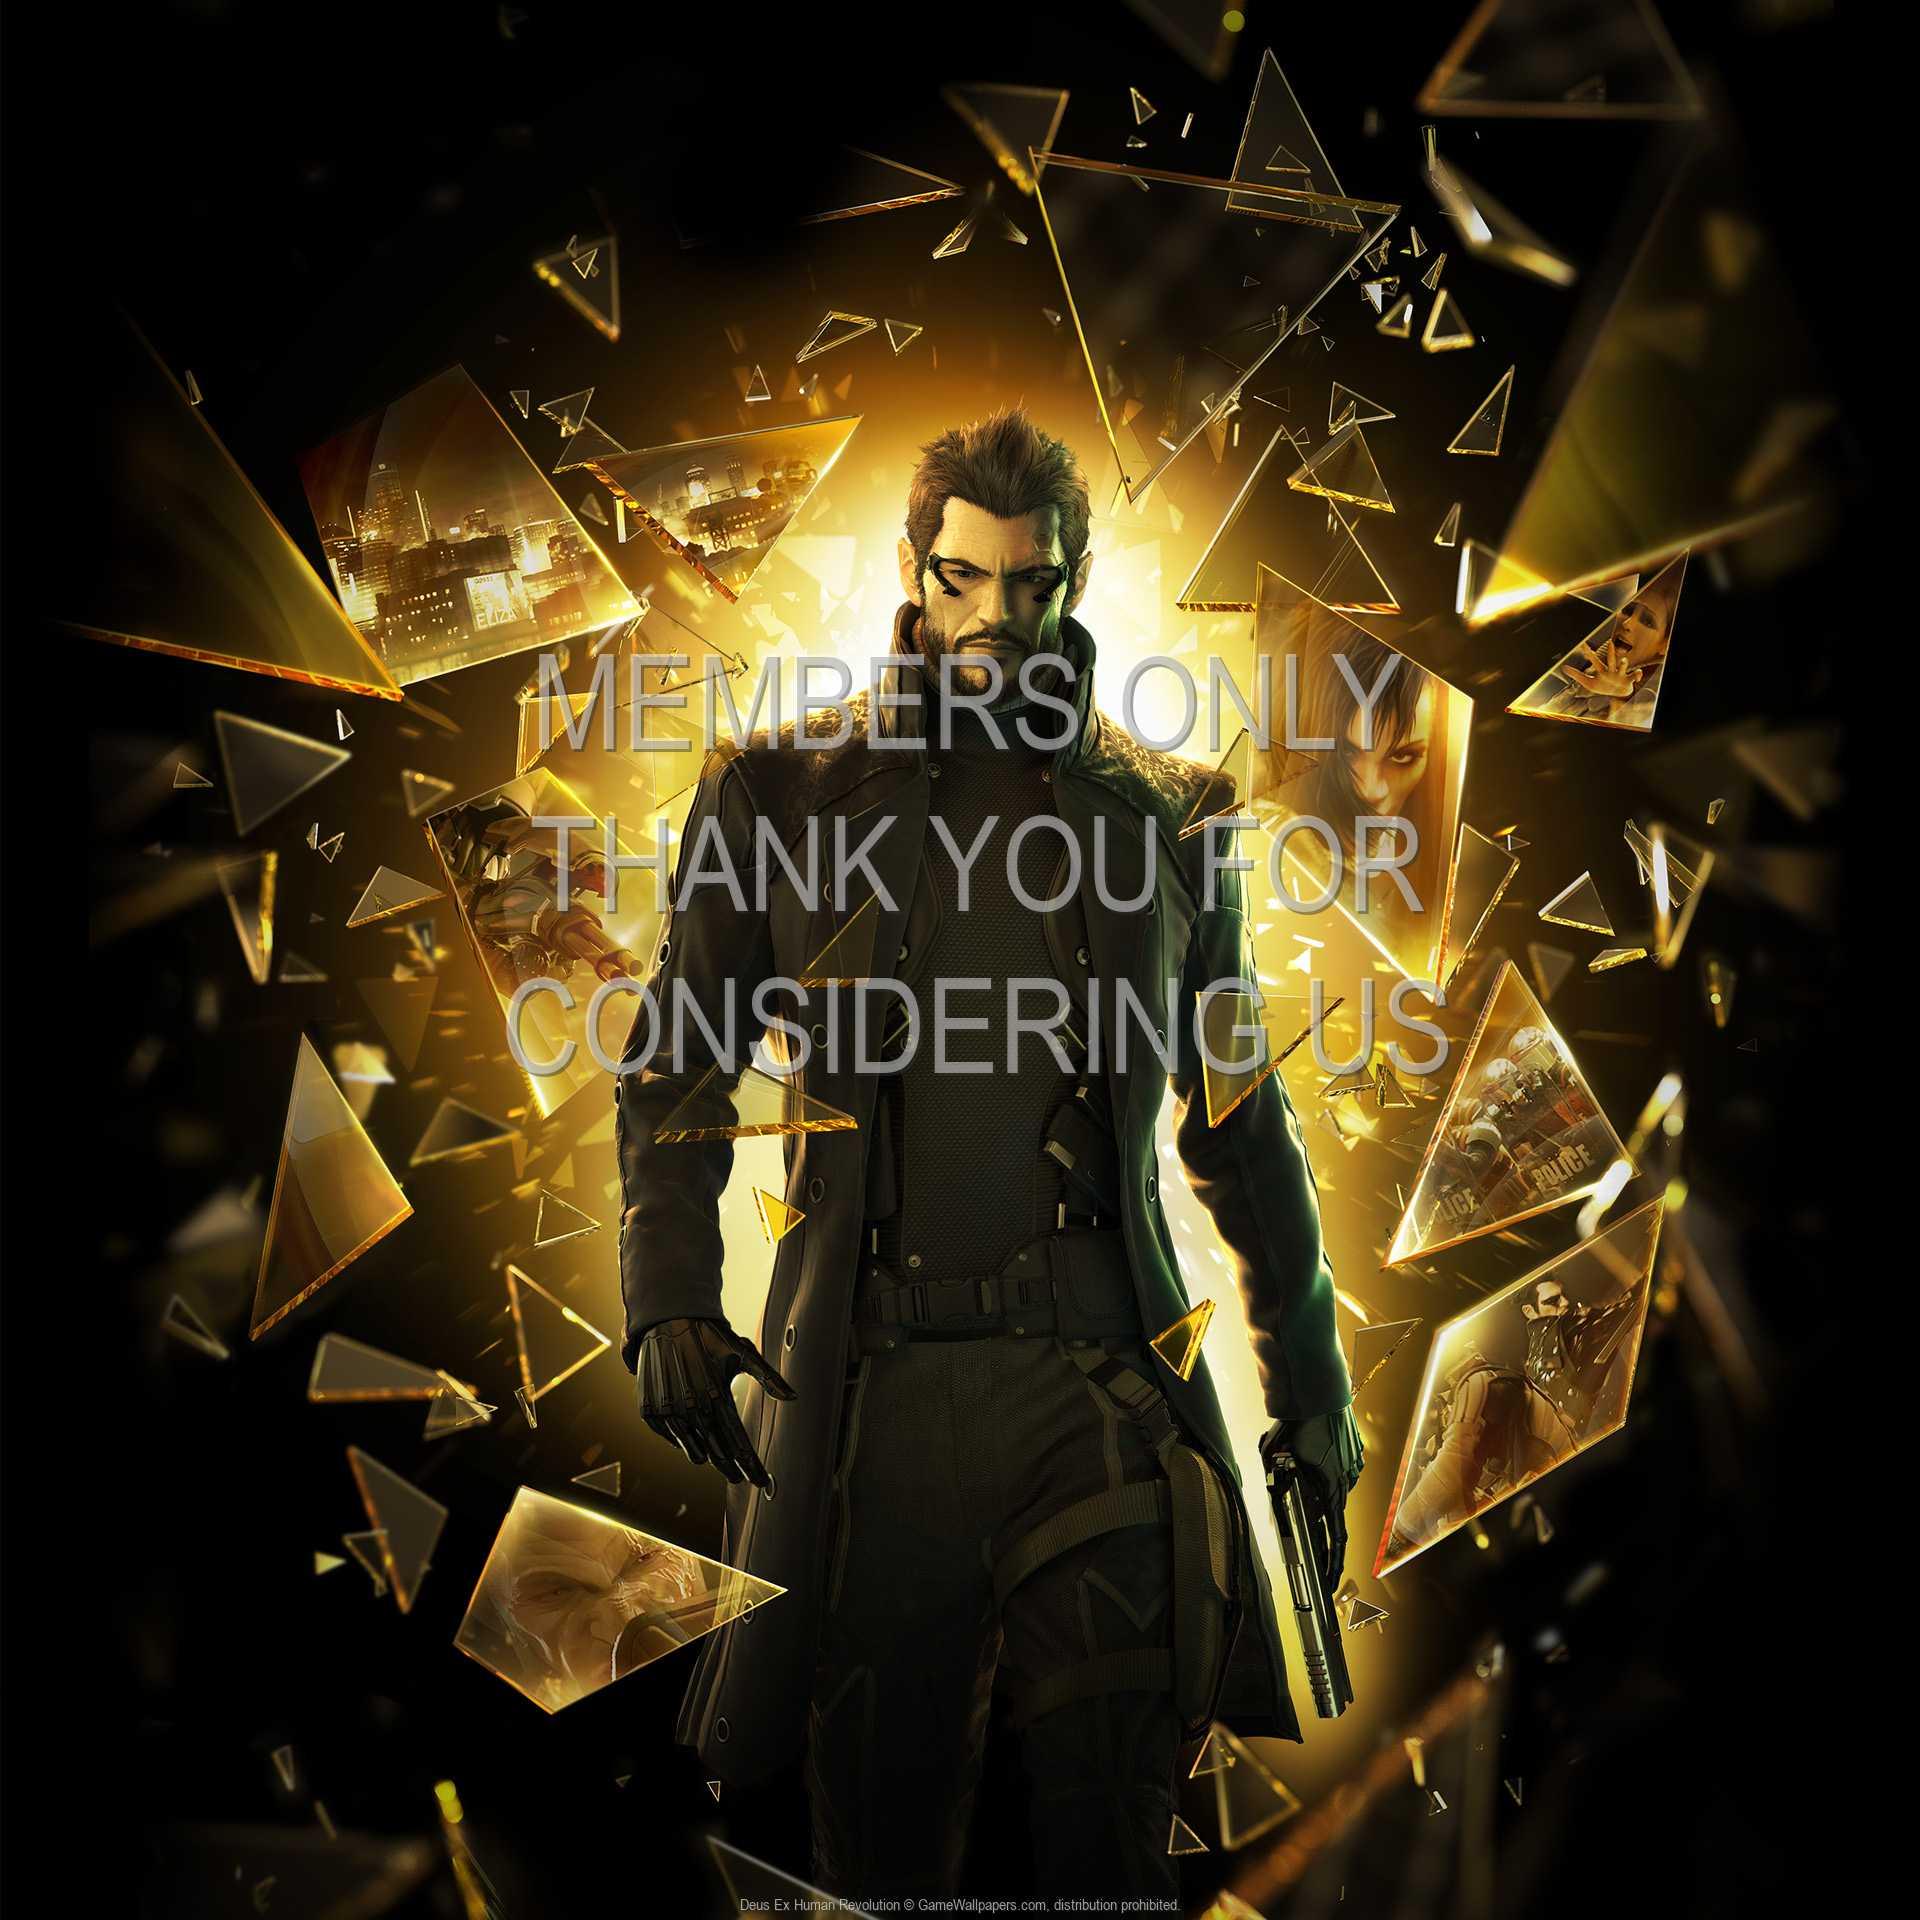 Deus Ex: Human Revolution 1080p Horizontal Mobile fond d'écran 08